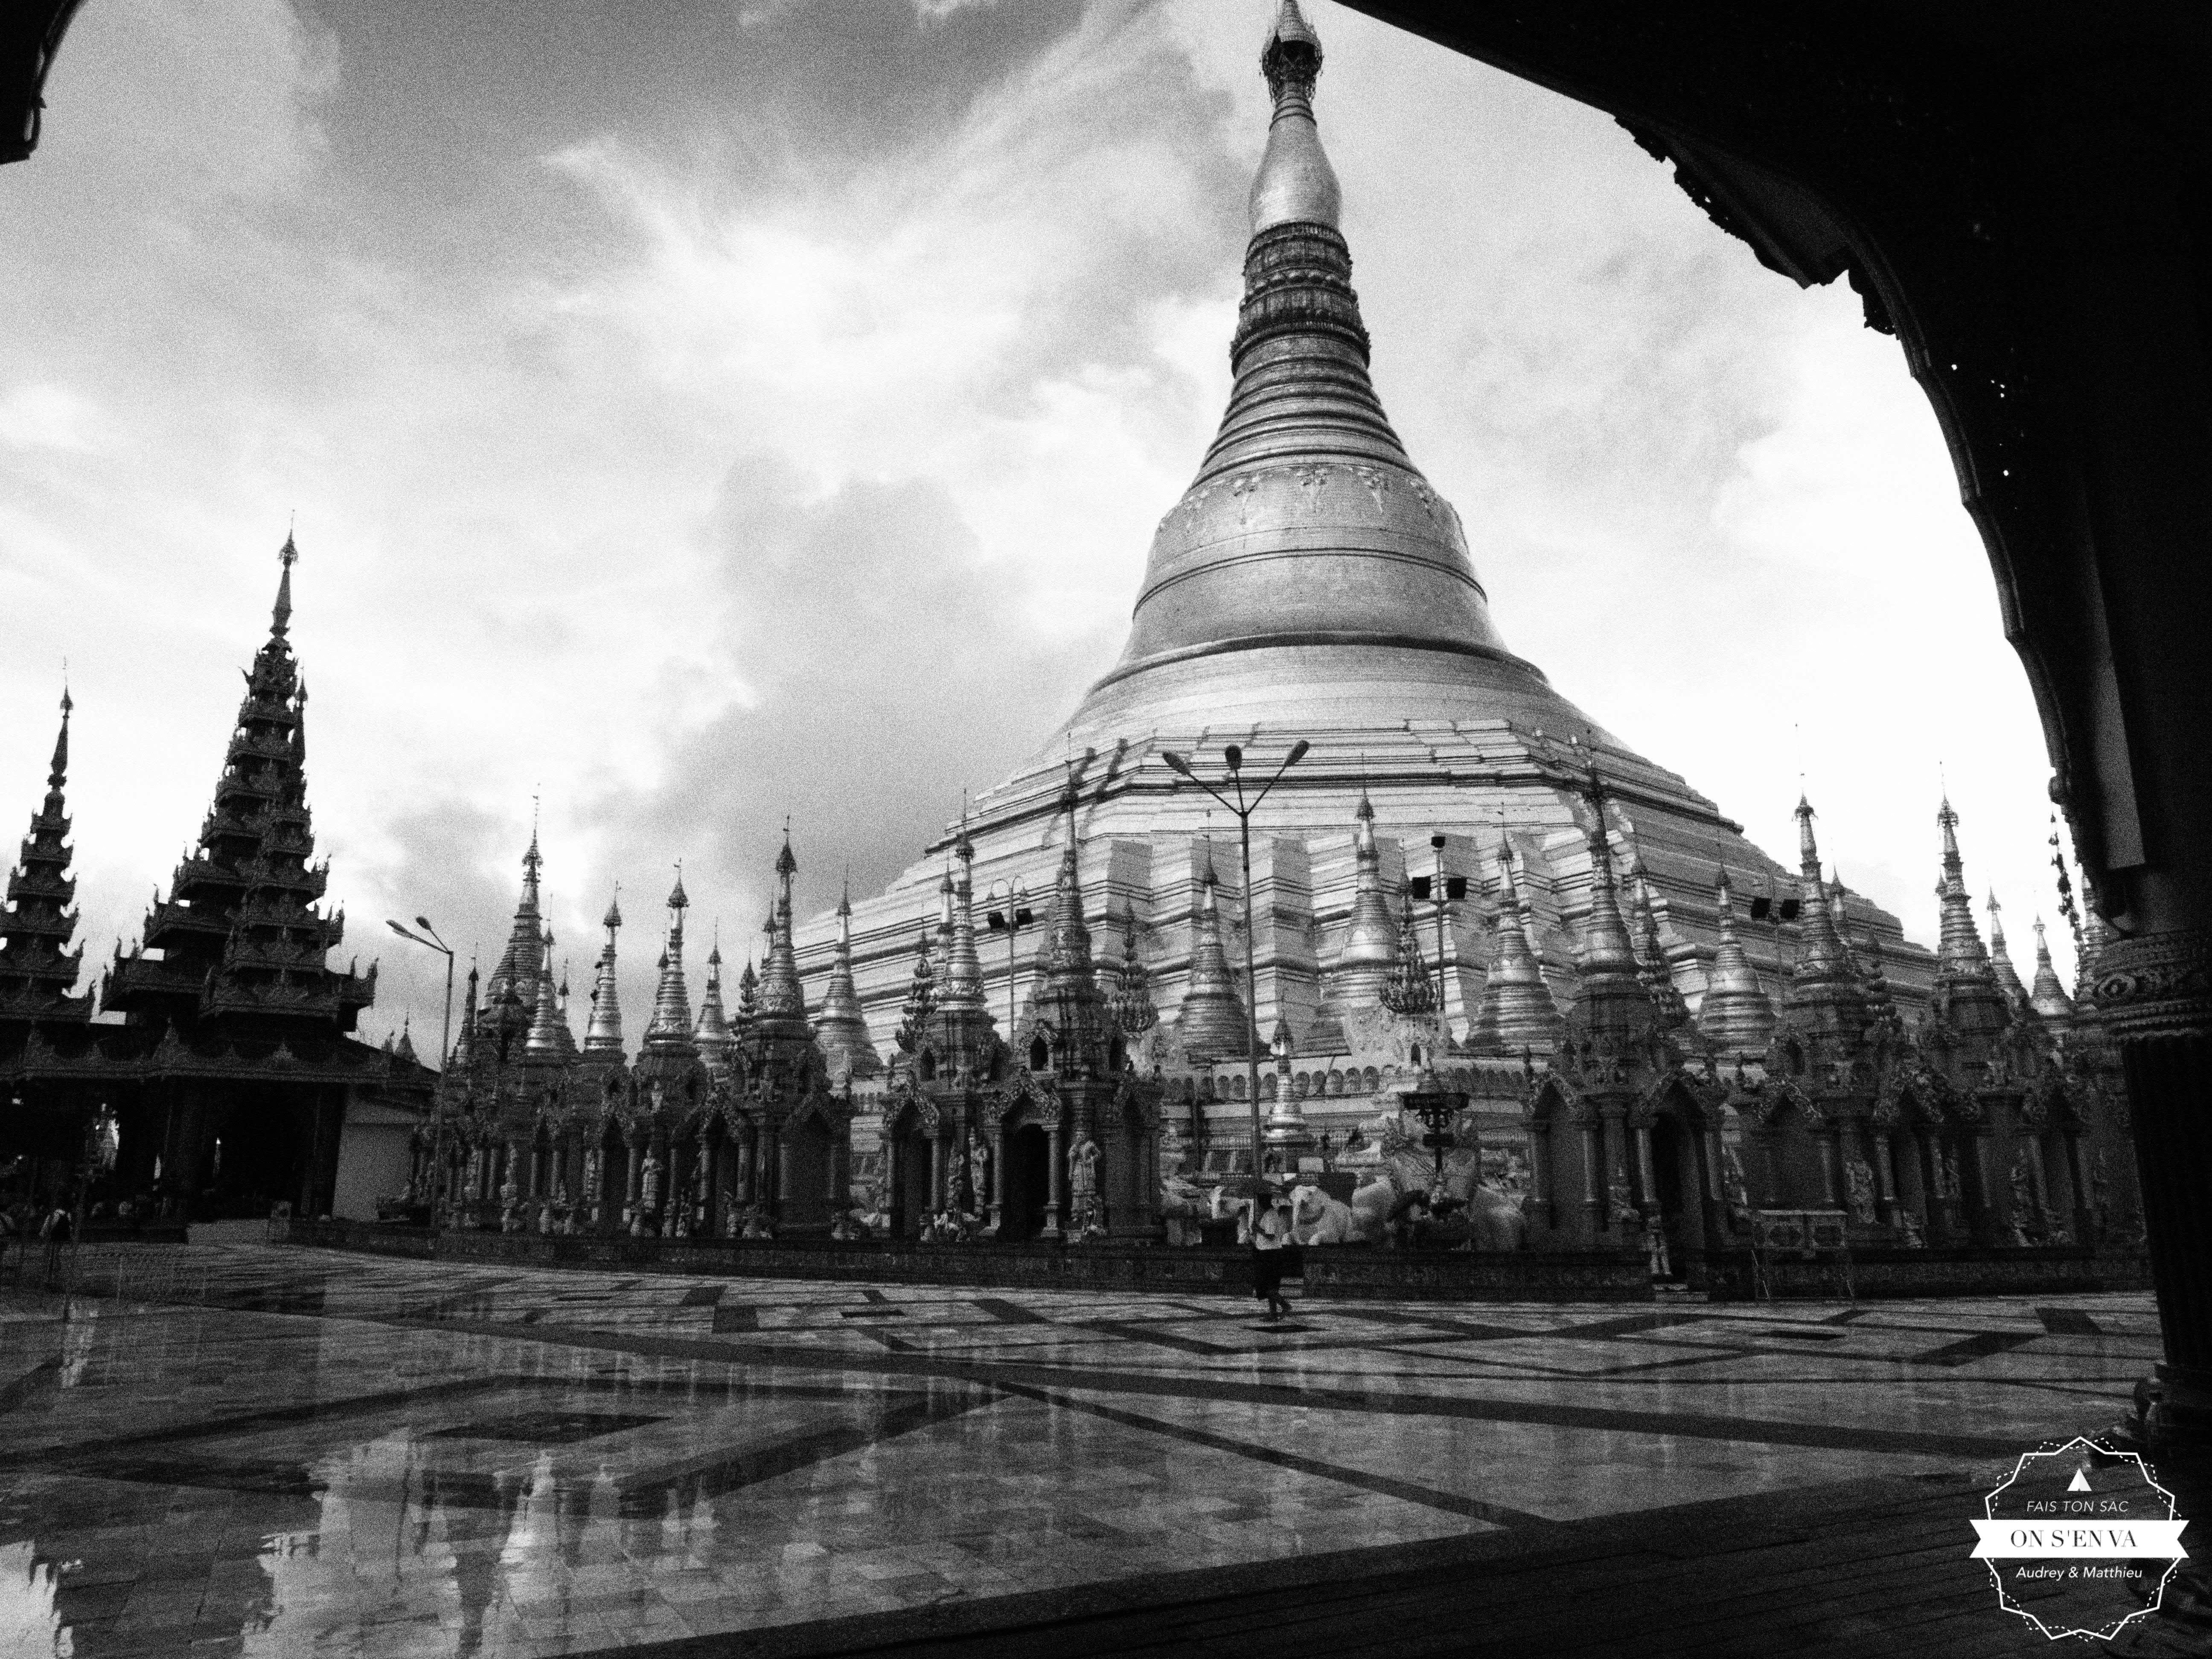 LA visite de Yangon